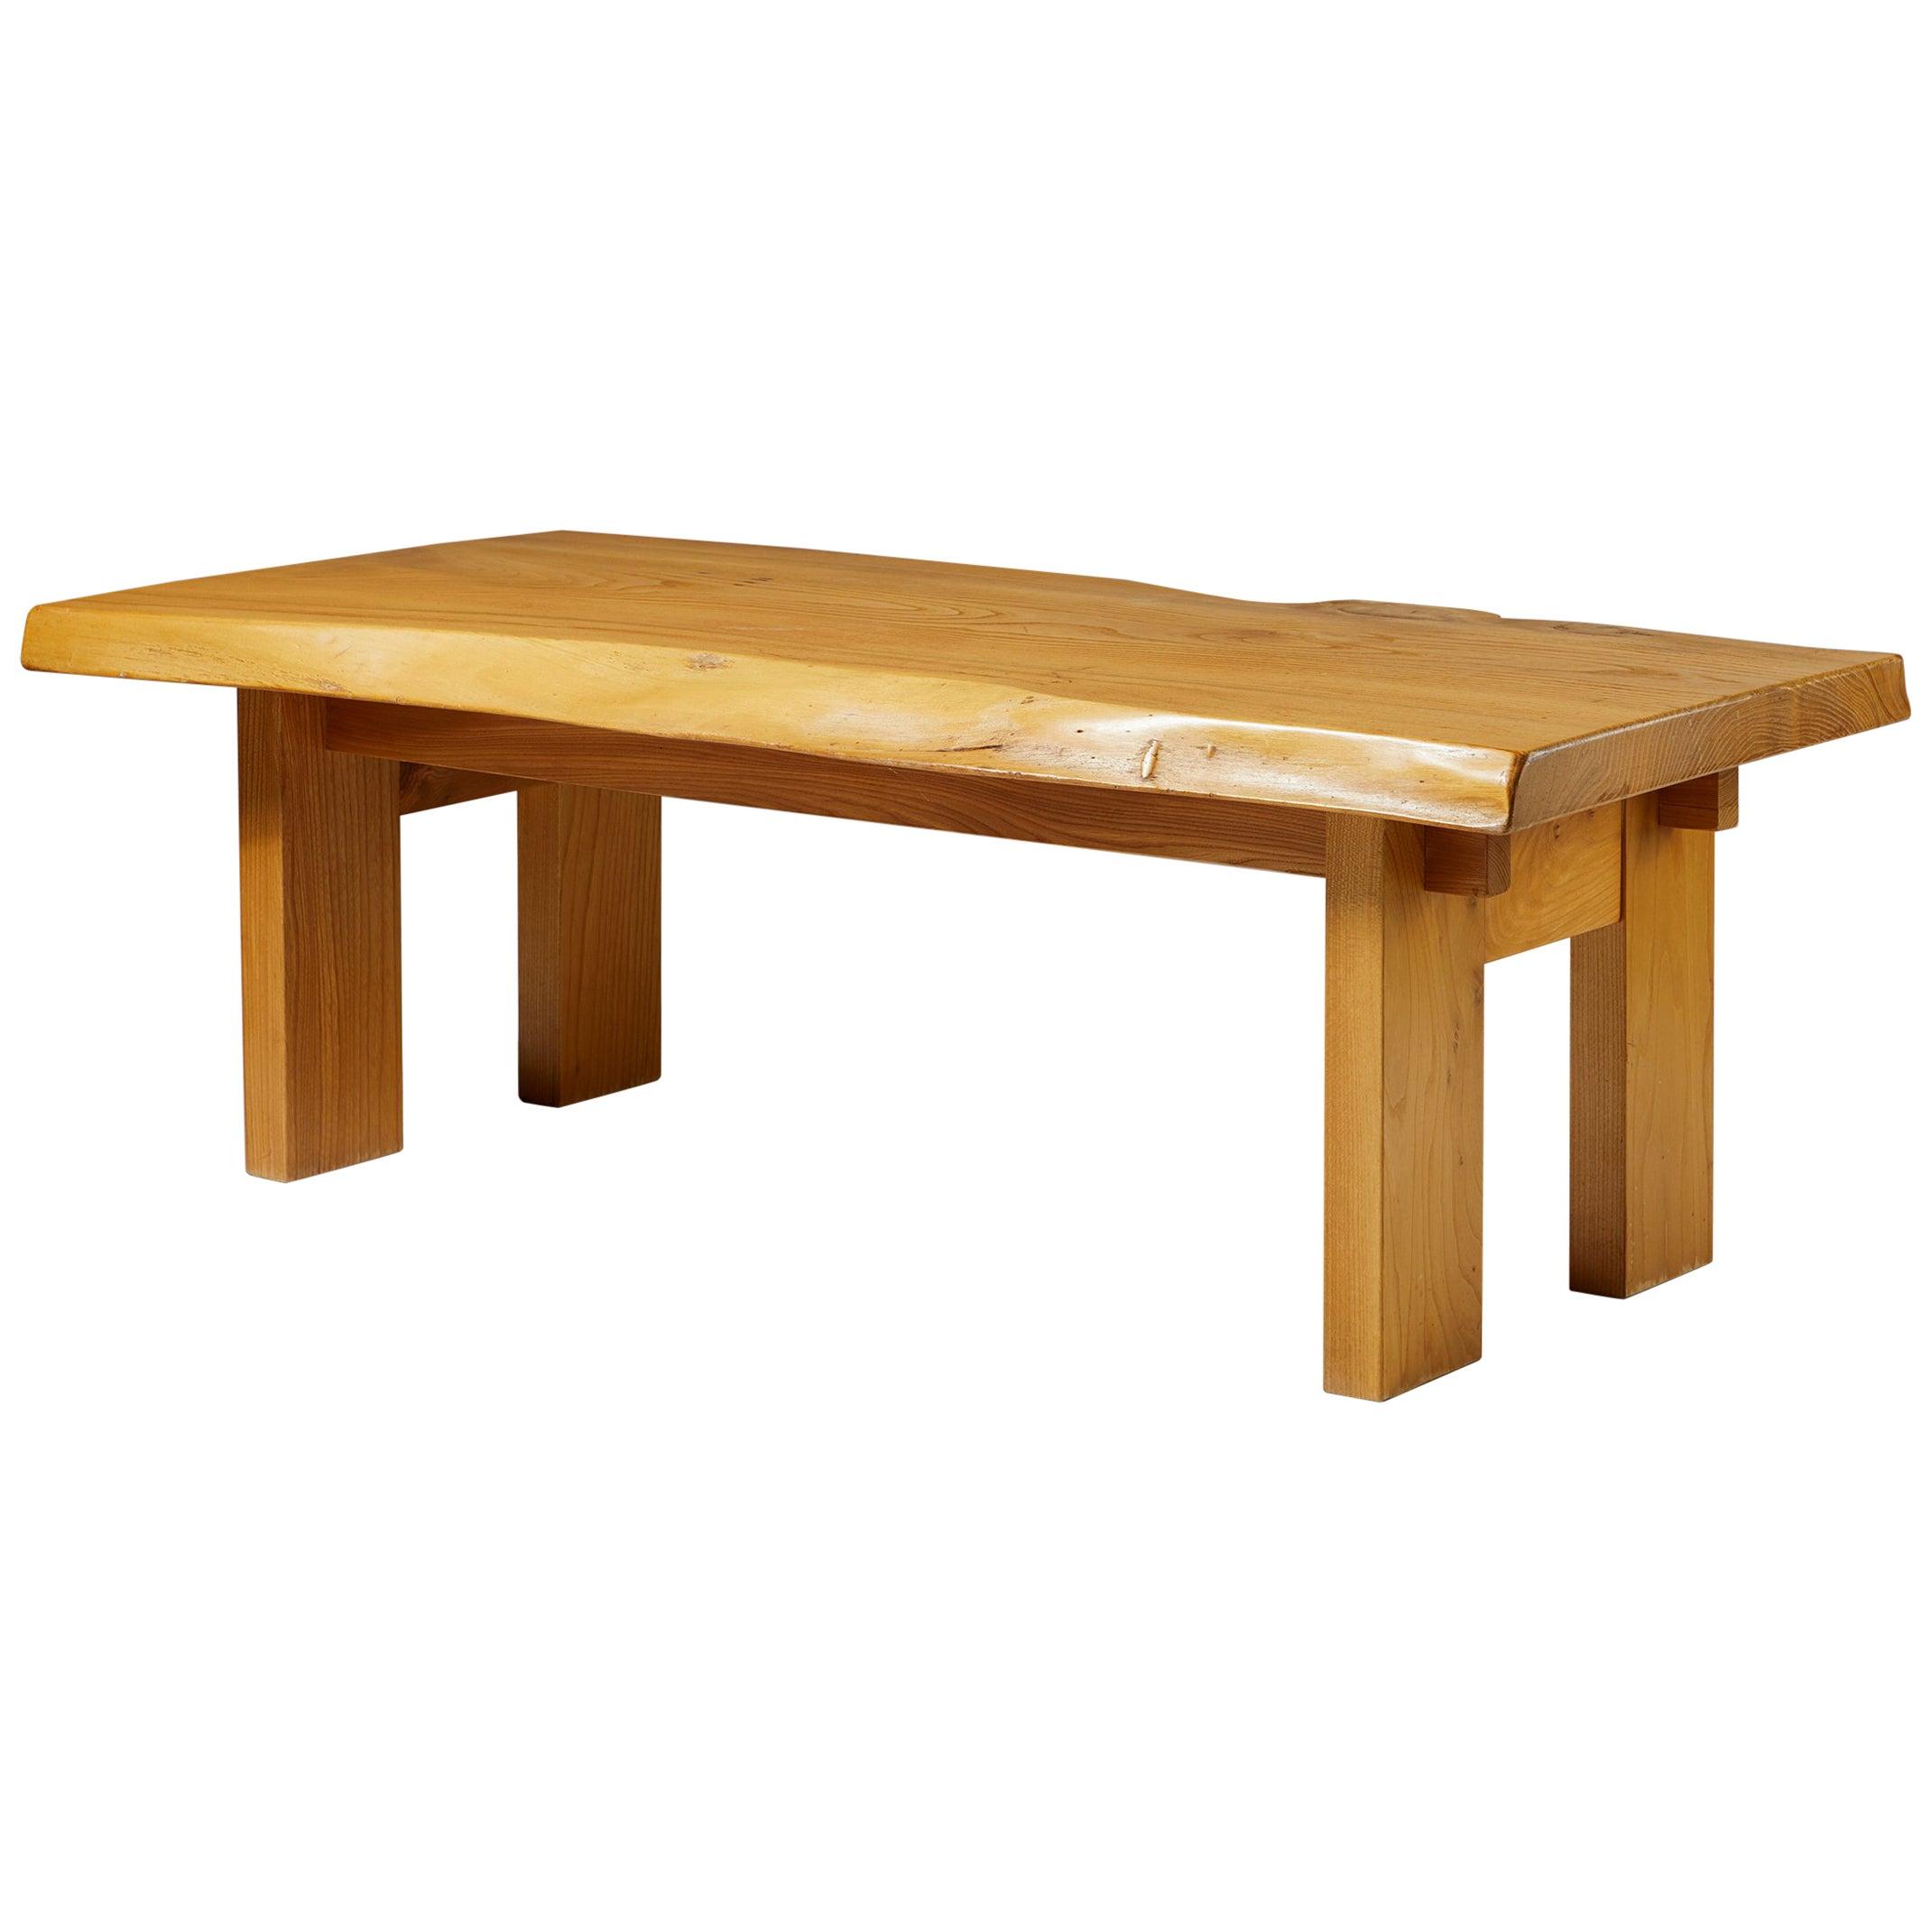 Bench/Table Designed by Sigvard Nilsson for Söwe-konst, Sweden. 1970s